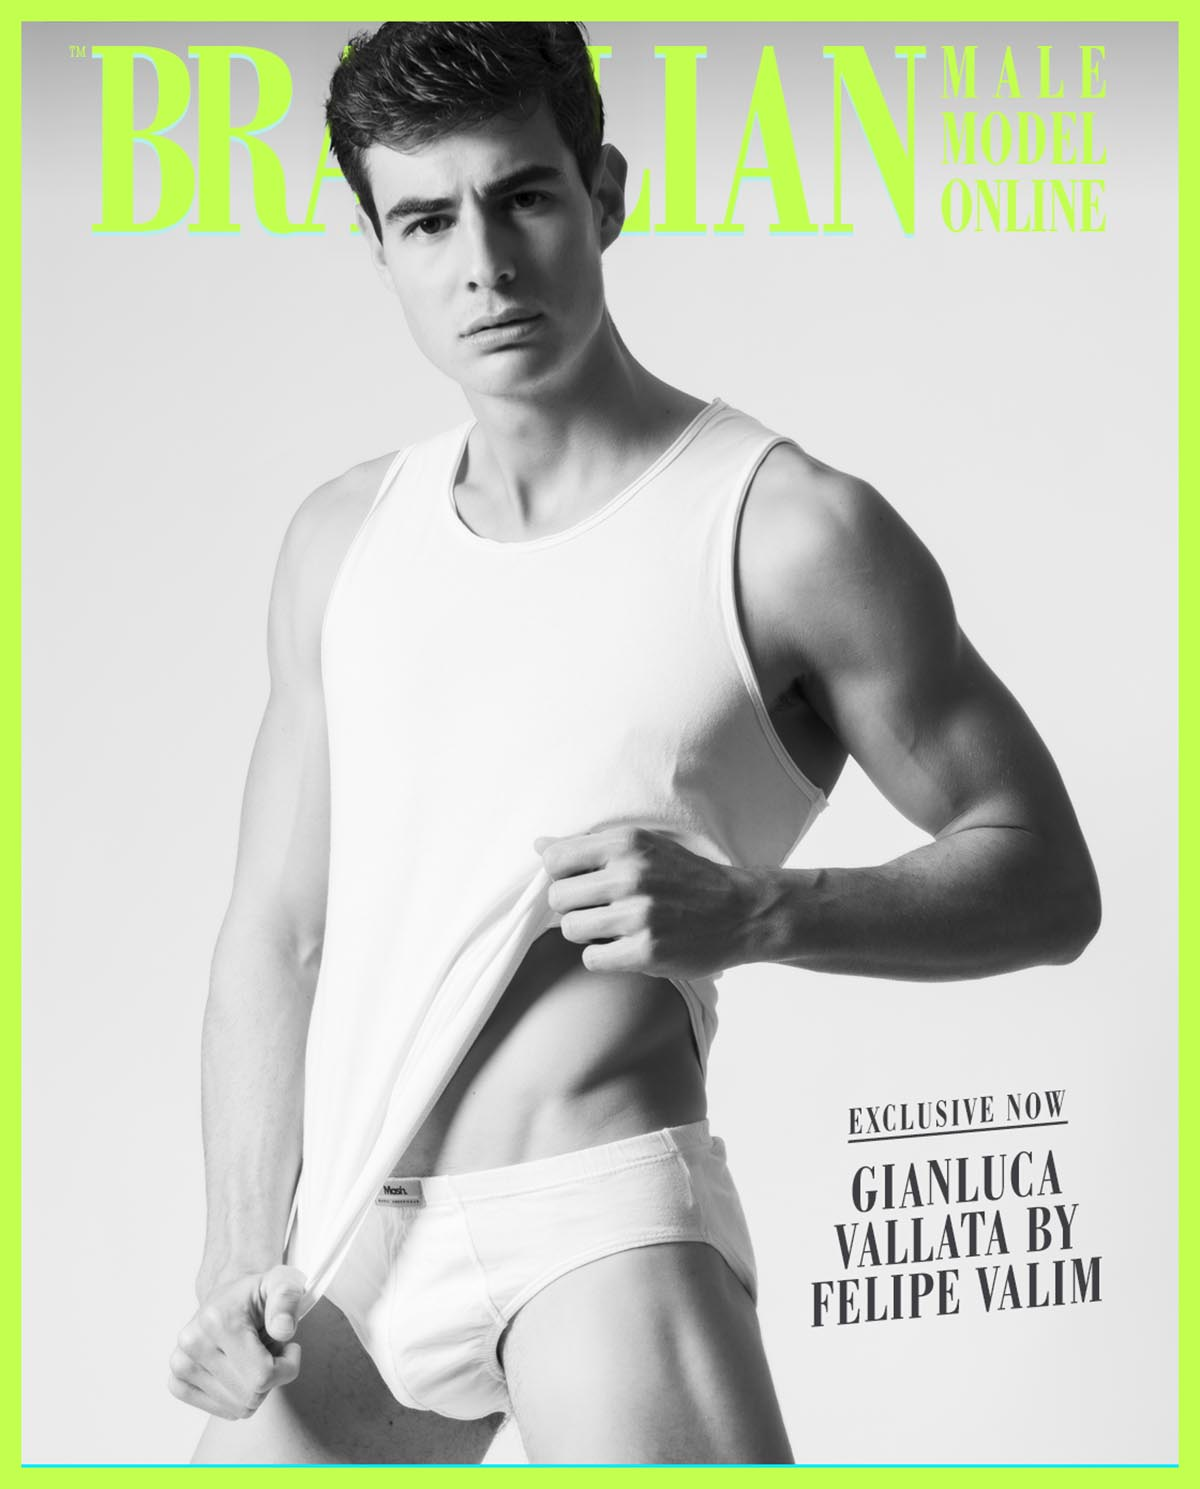 Gianluca Vallata X Felipe Valim X Brazilian Male Model X YUP MAGAZINE